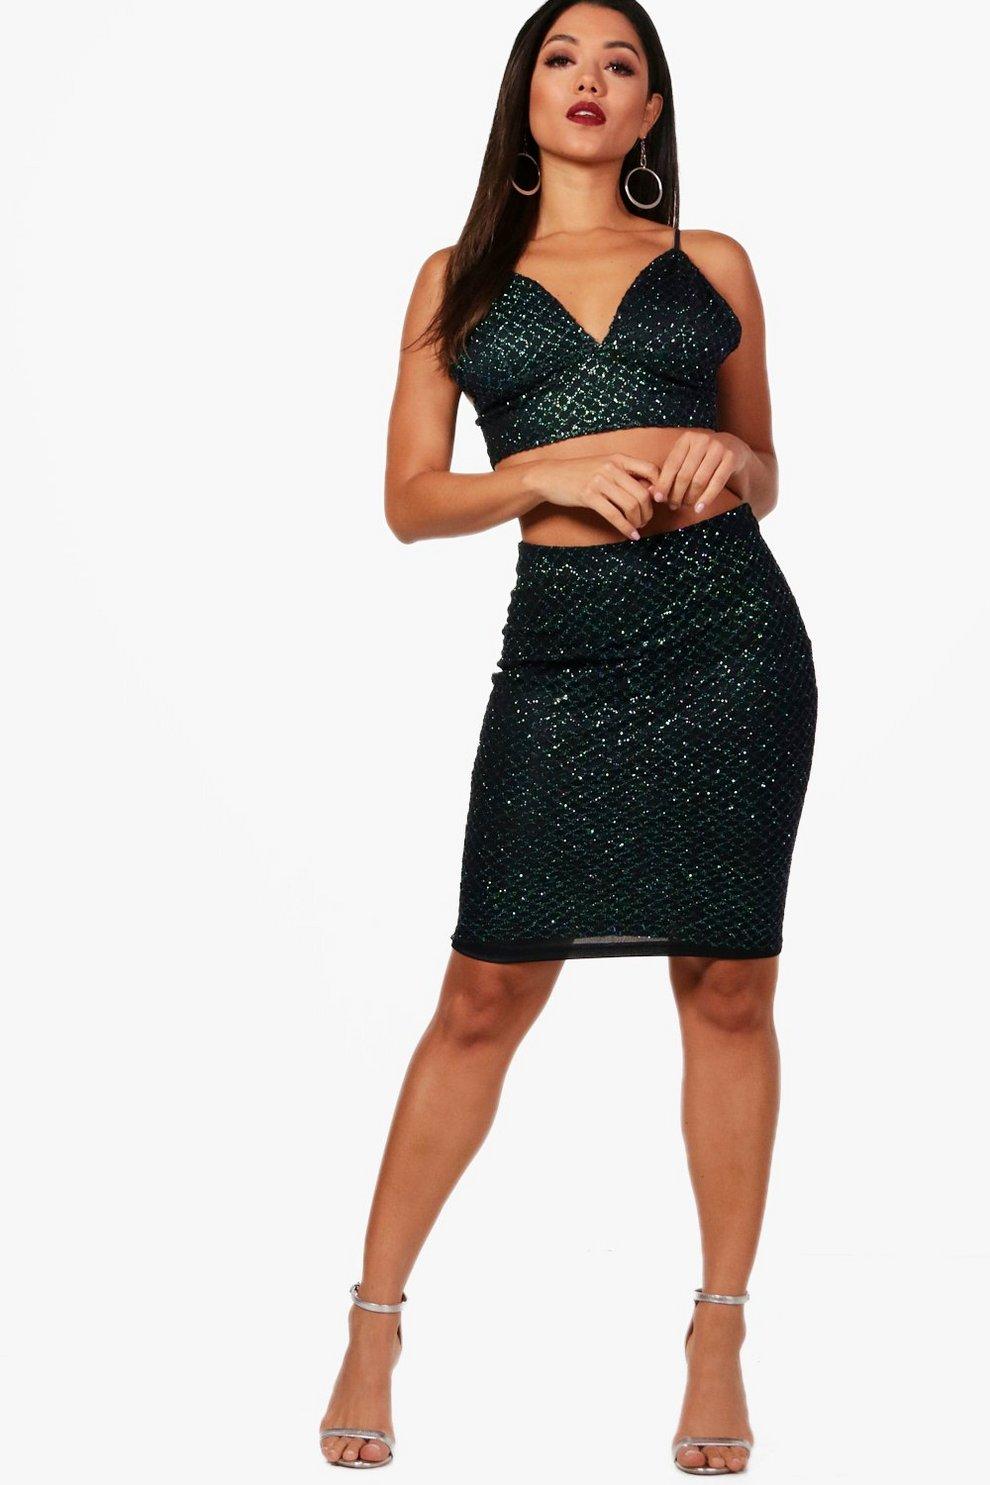 2018 Newest Online Boohoo Sequin Bralet and Skirt Set Explore Cheap Online Ost Release Dates Discounts Sale Online OWeV2xPP2